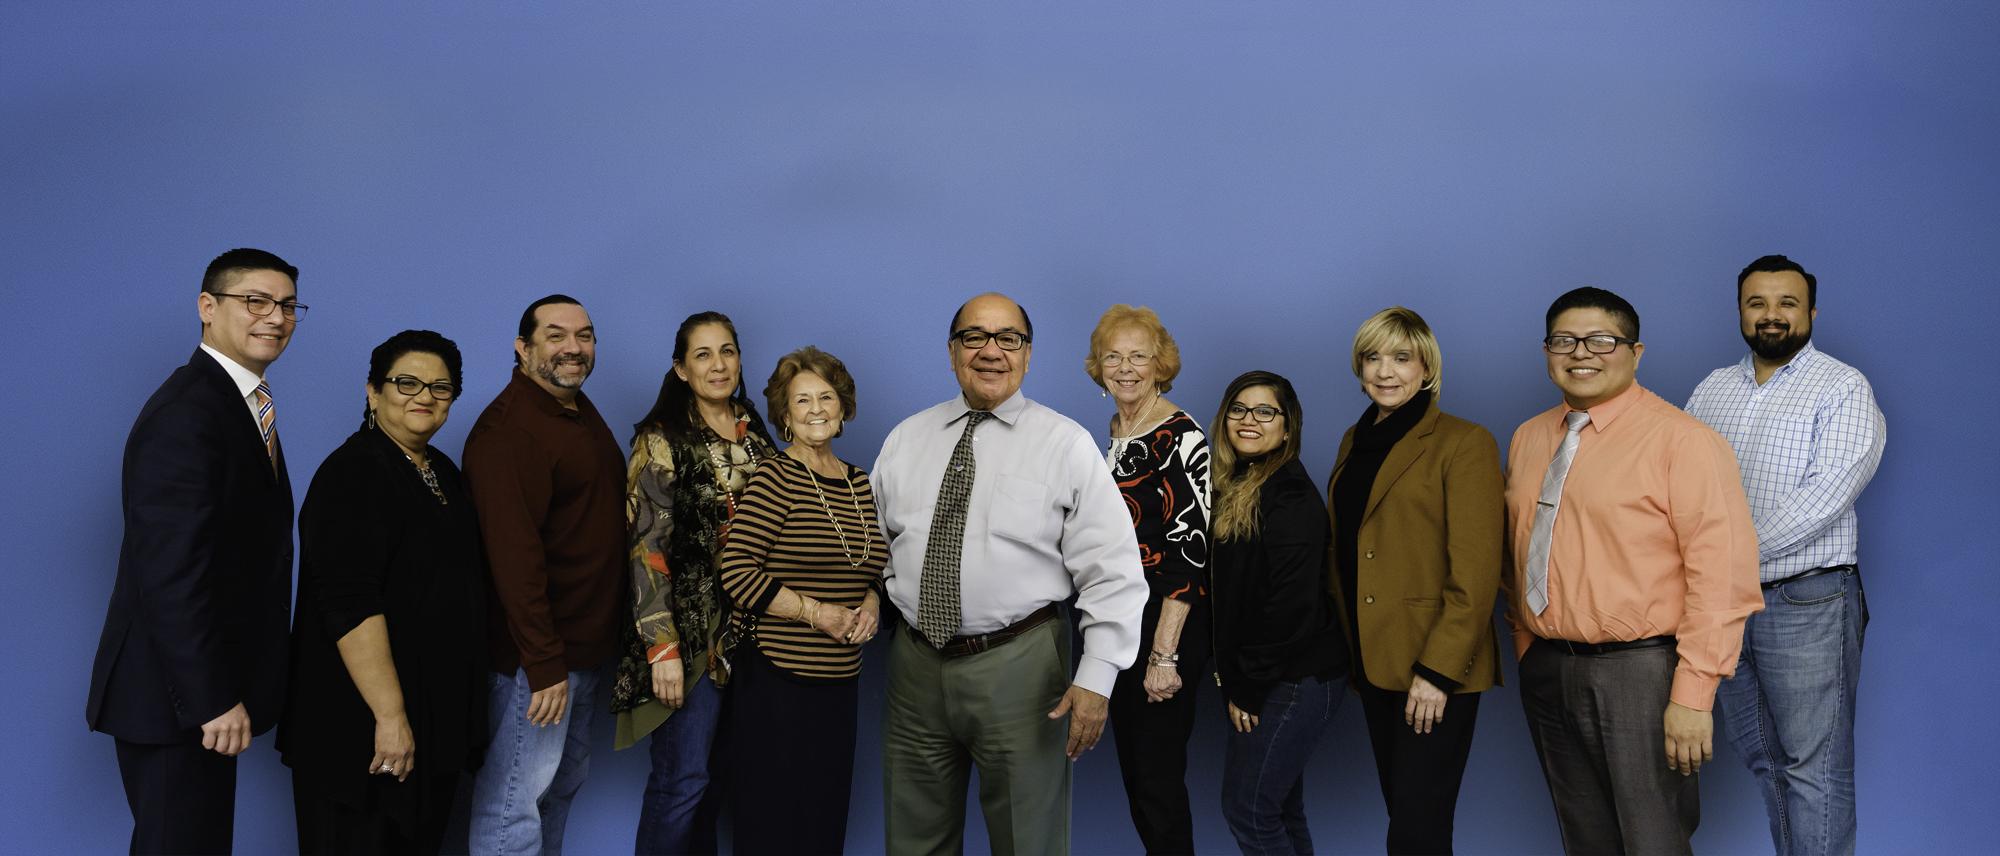 Left to right: Ebrahim Morales, Letty Leija, Leonel Guerrero, Mary Lou Escobedo, Bennie Kay Carlson, Agustin Lozano, Vivian Martin, Sonia Gonzalez, Maria Elena Macias, Magdiel Castle, Pedro Perez.